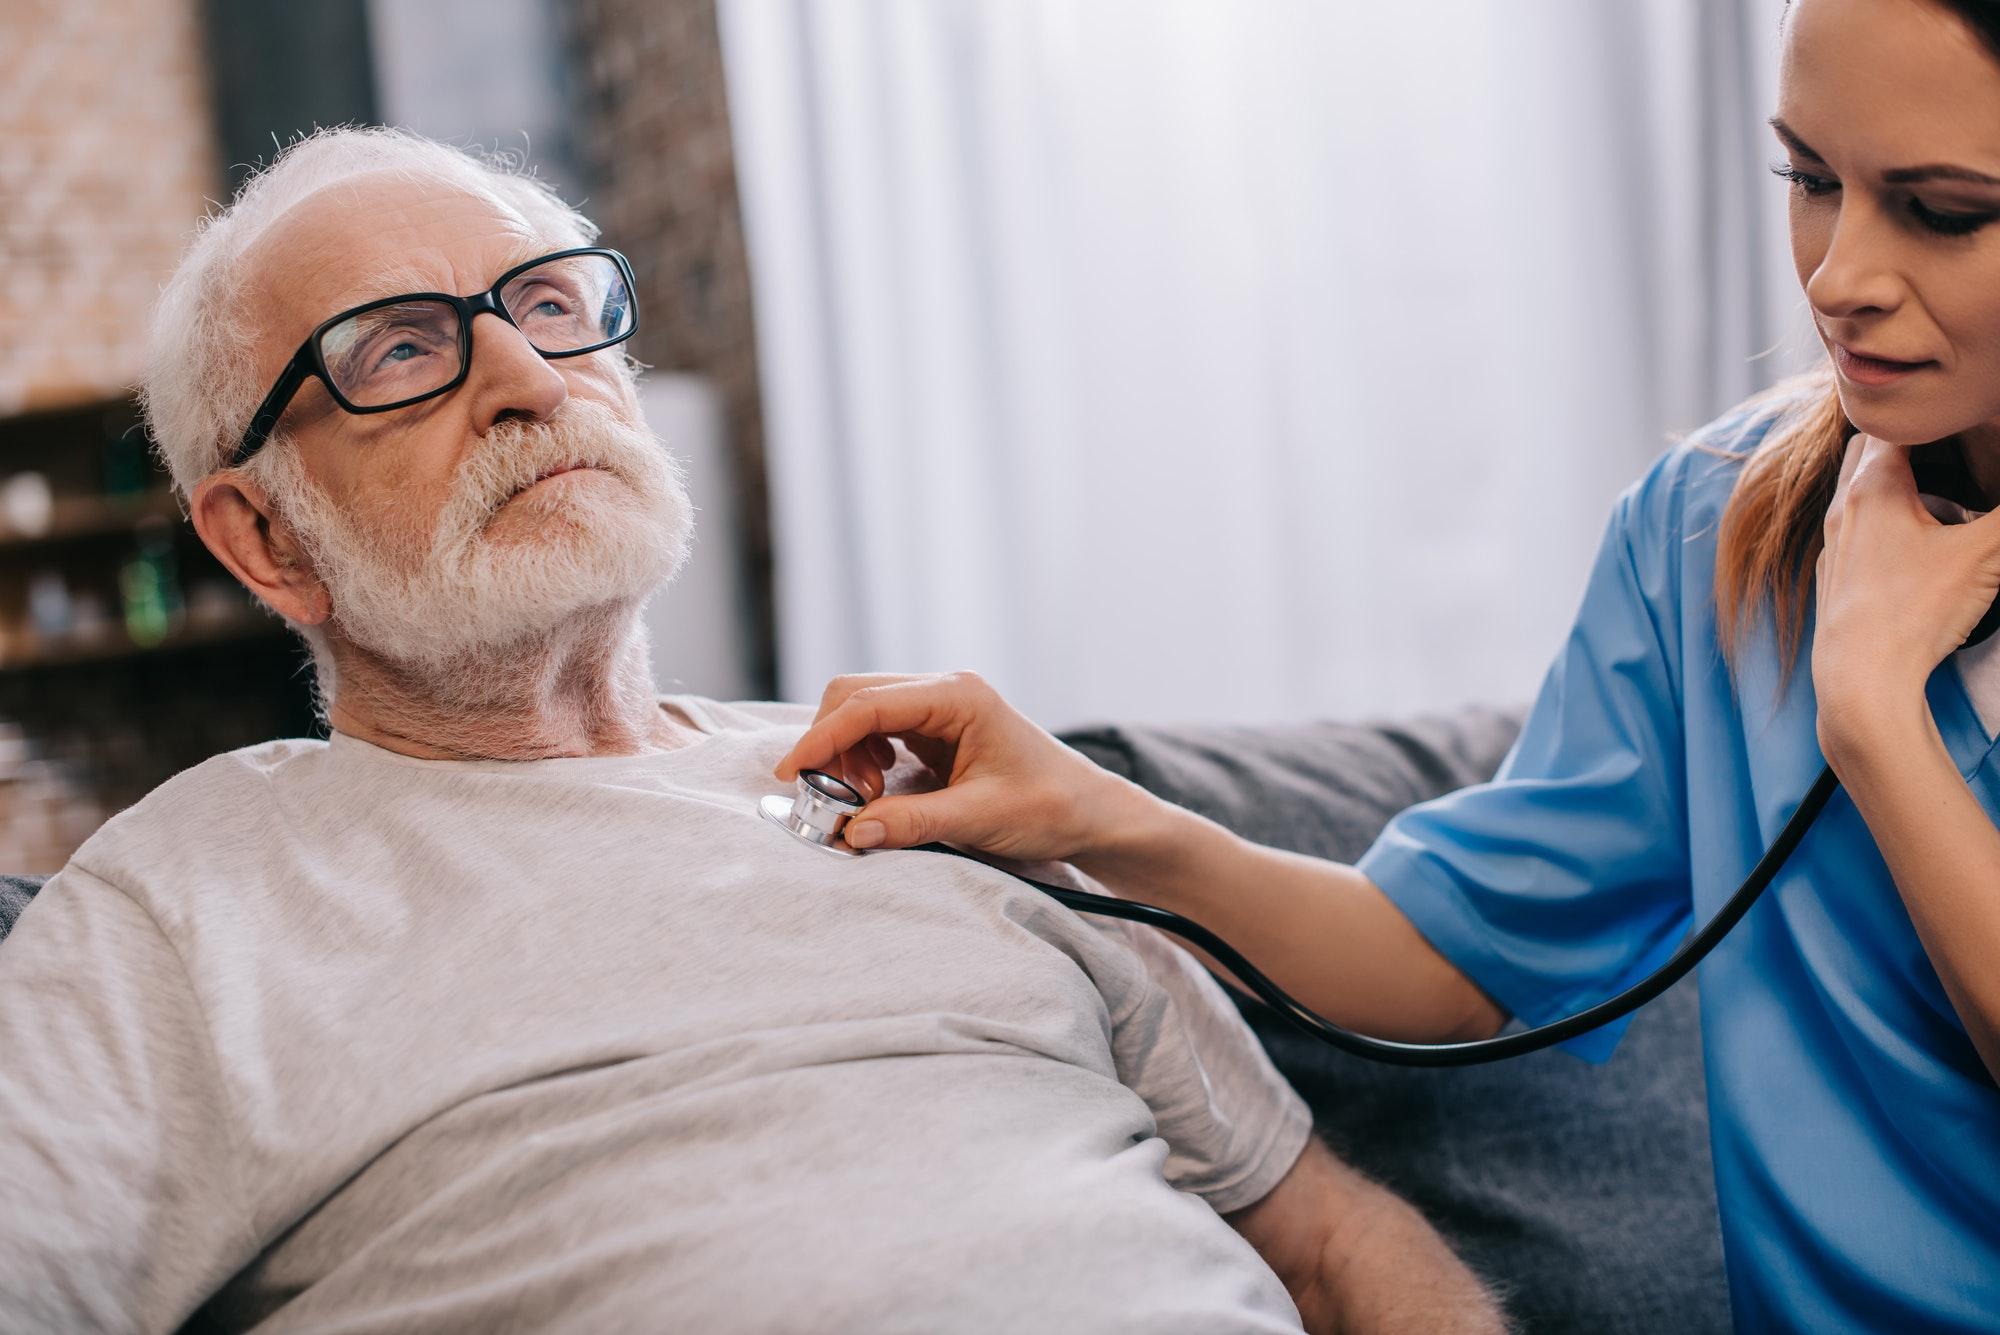 Nurse with stethoscope checking heartbeat of senior man